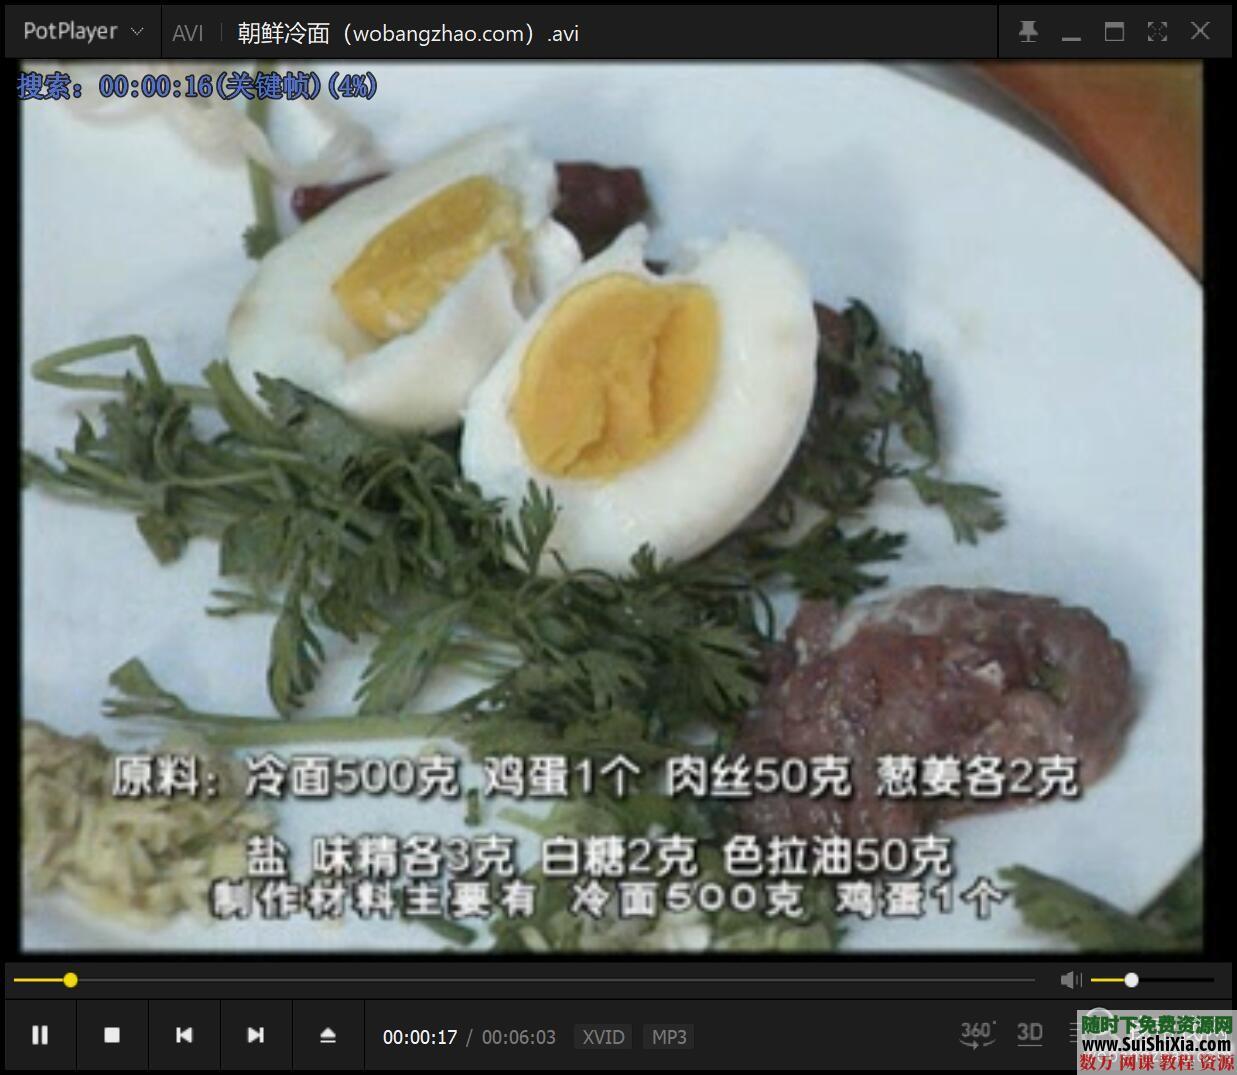 11G面条高汤面食制作配方牛肉面拉面冷面炸酱面小吃技术学习教程视频MP4 第7张